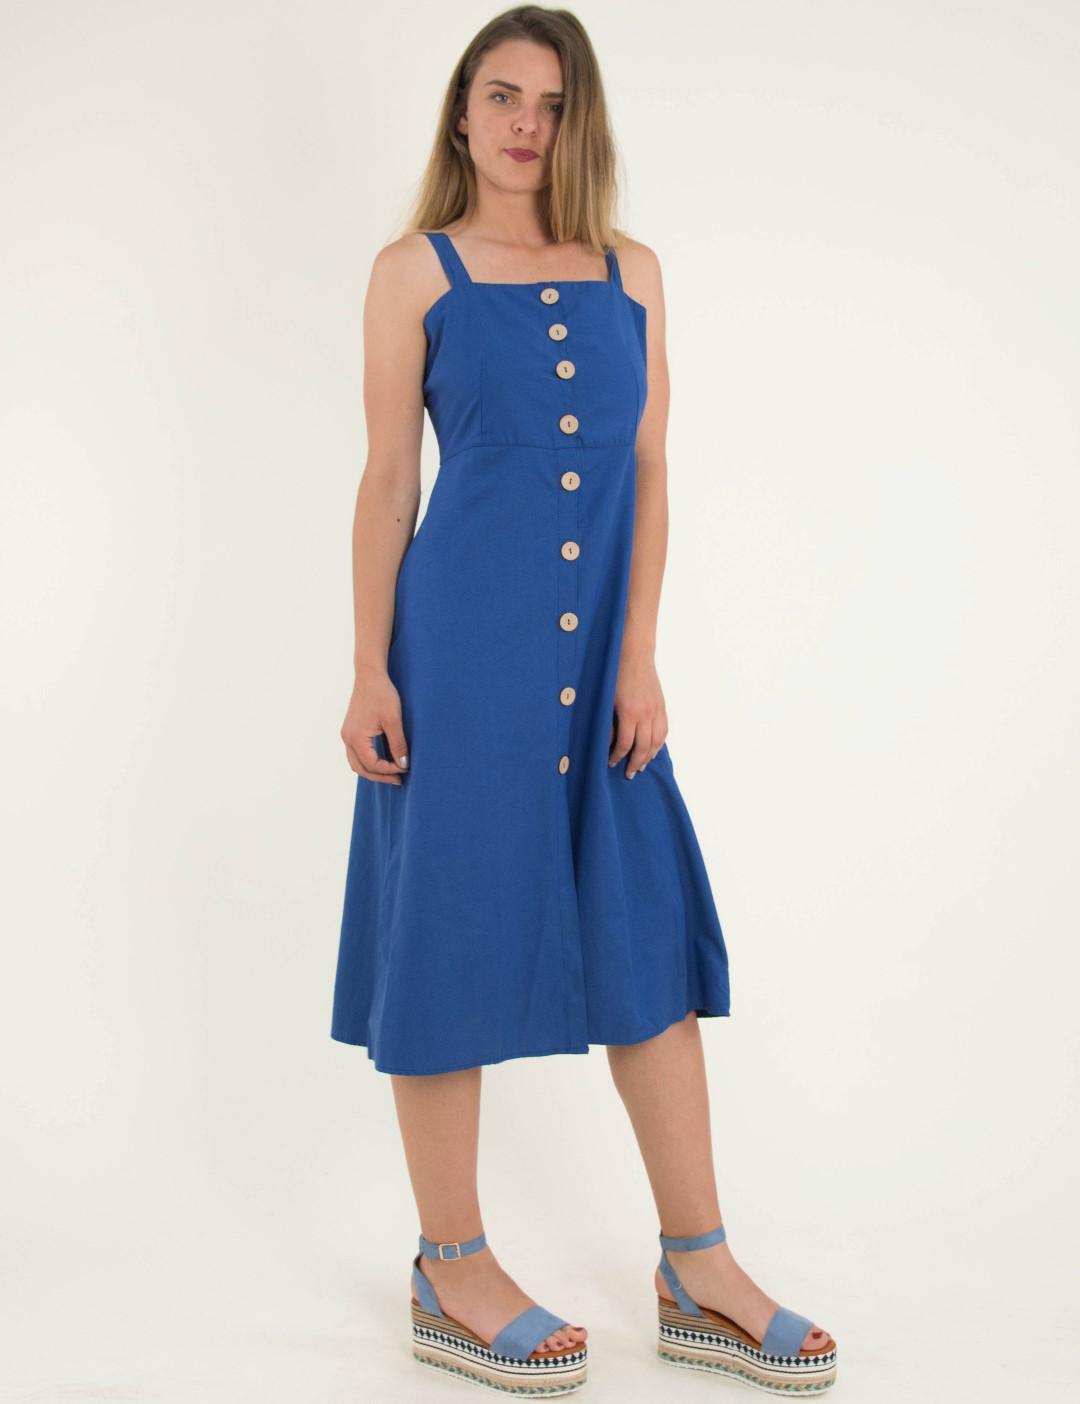 9c0d10fb6fb Γυναικείο μπλε ραφ μίντι φόρεμα με ράντες και κουμπιά 9926X